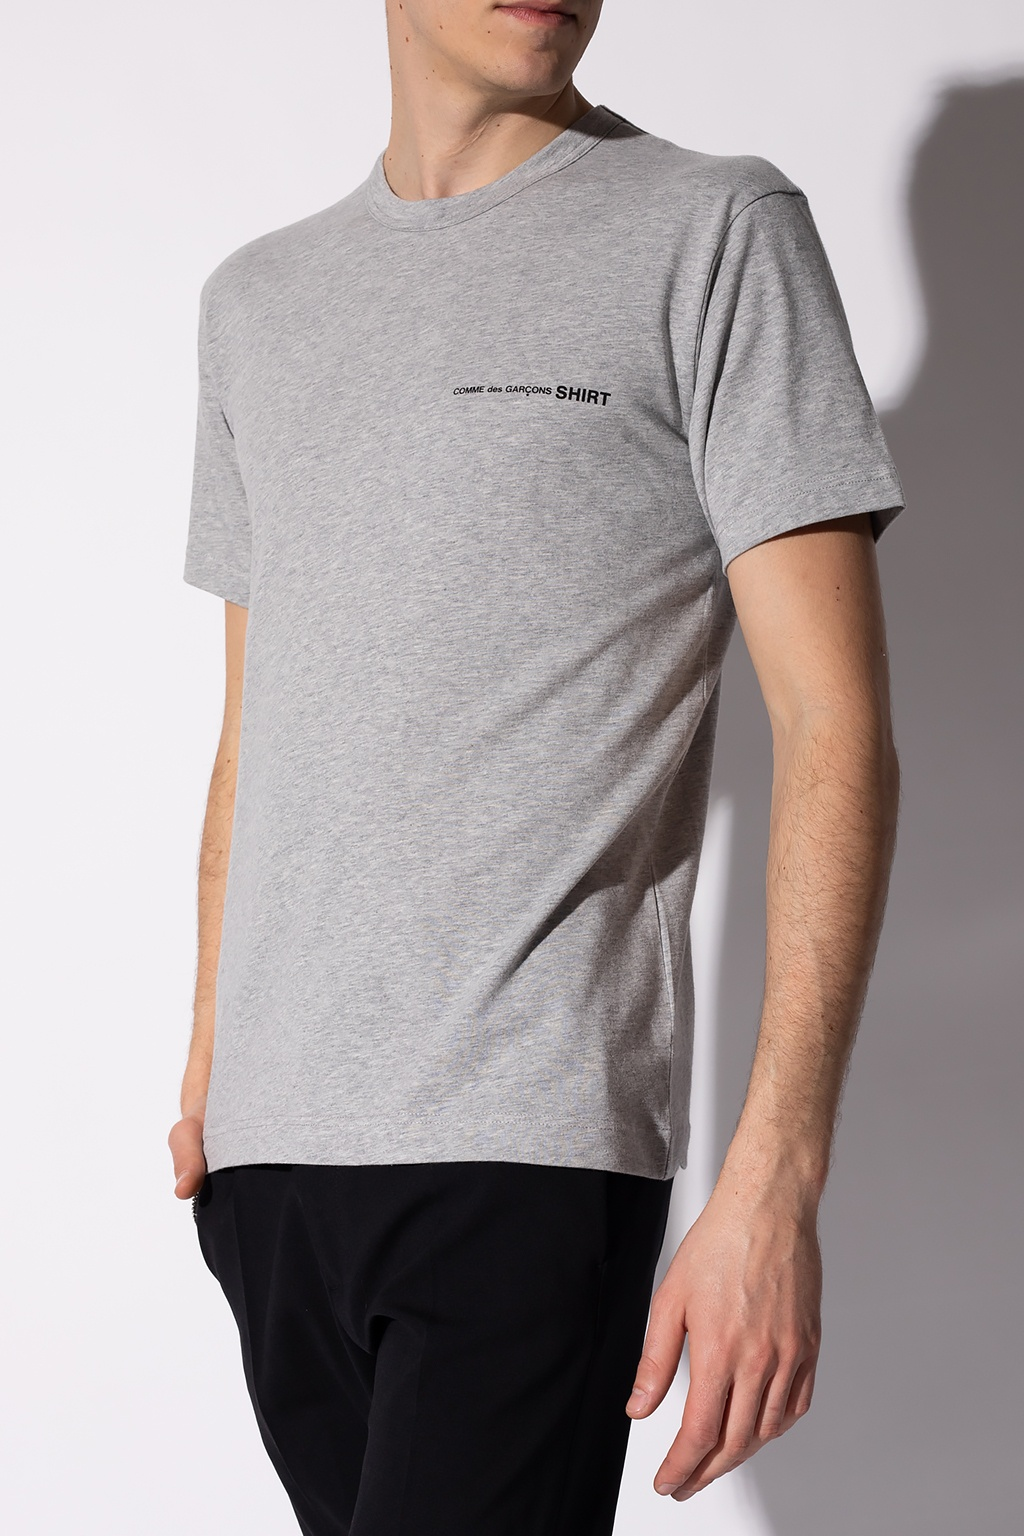 Comme des Garcons Shirt T-shirt with logo